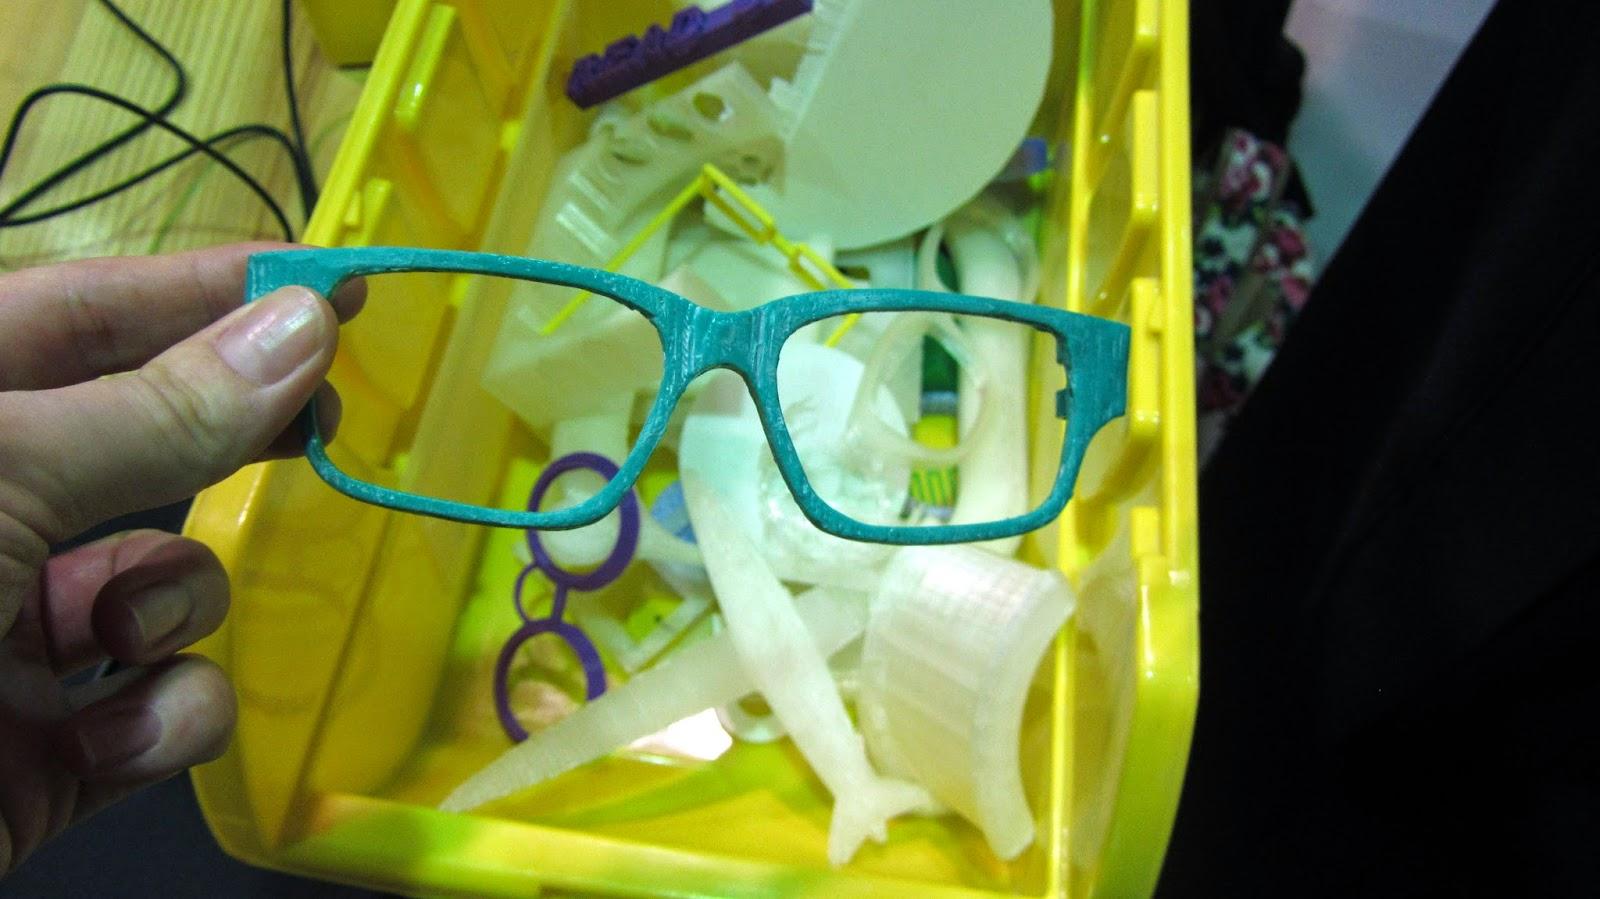 3D glasses FABLAB KFUPM Dhahran Saudi Araiba blogging